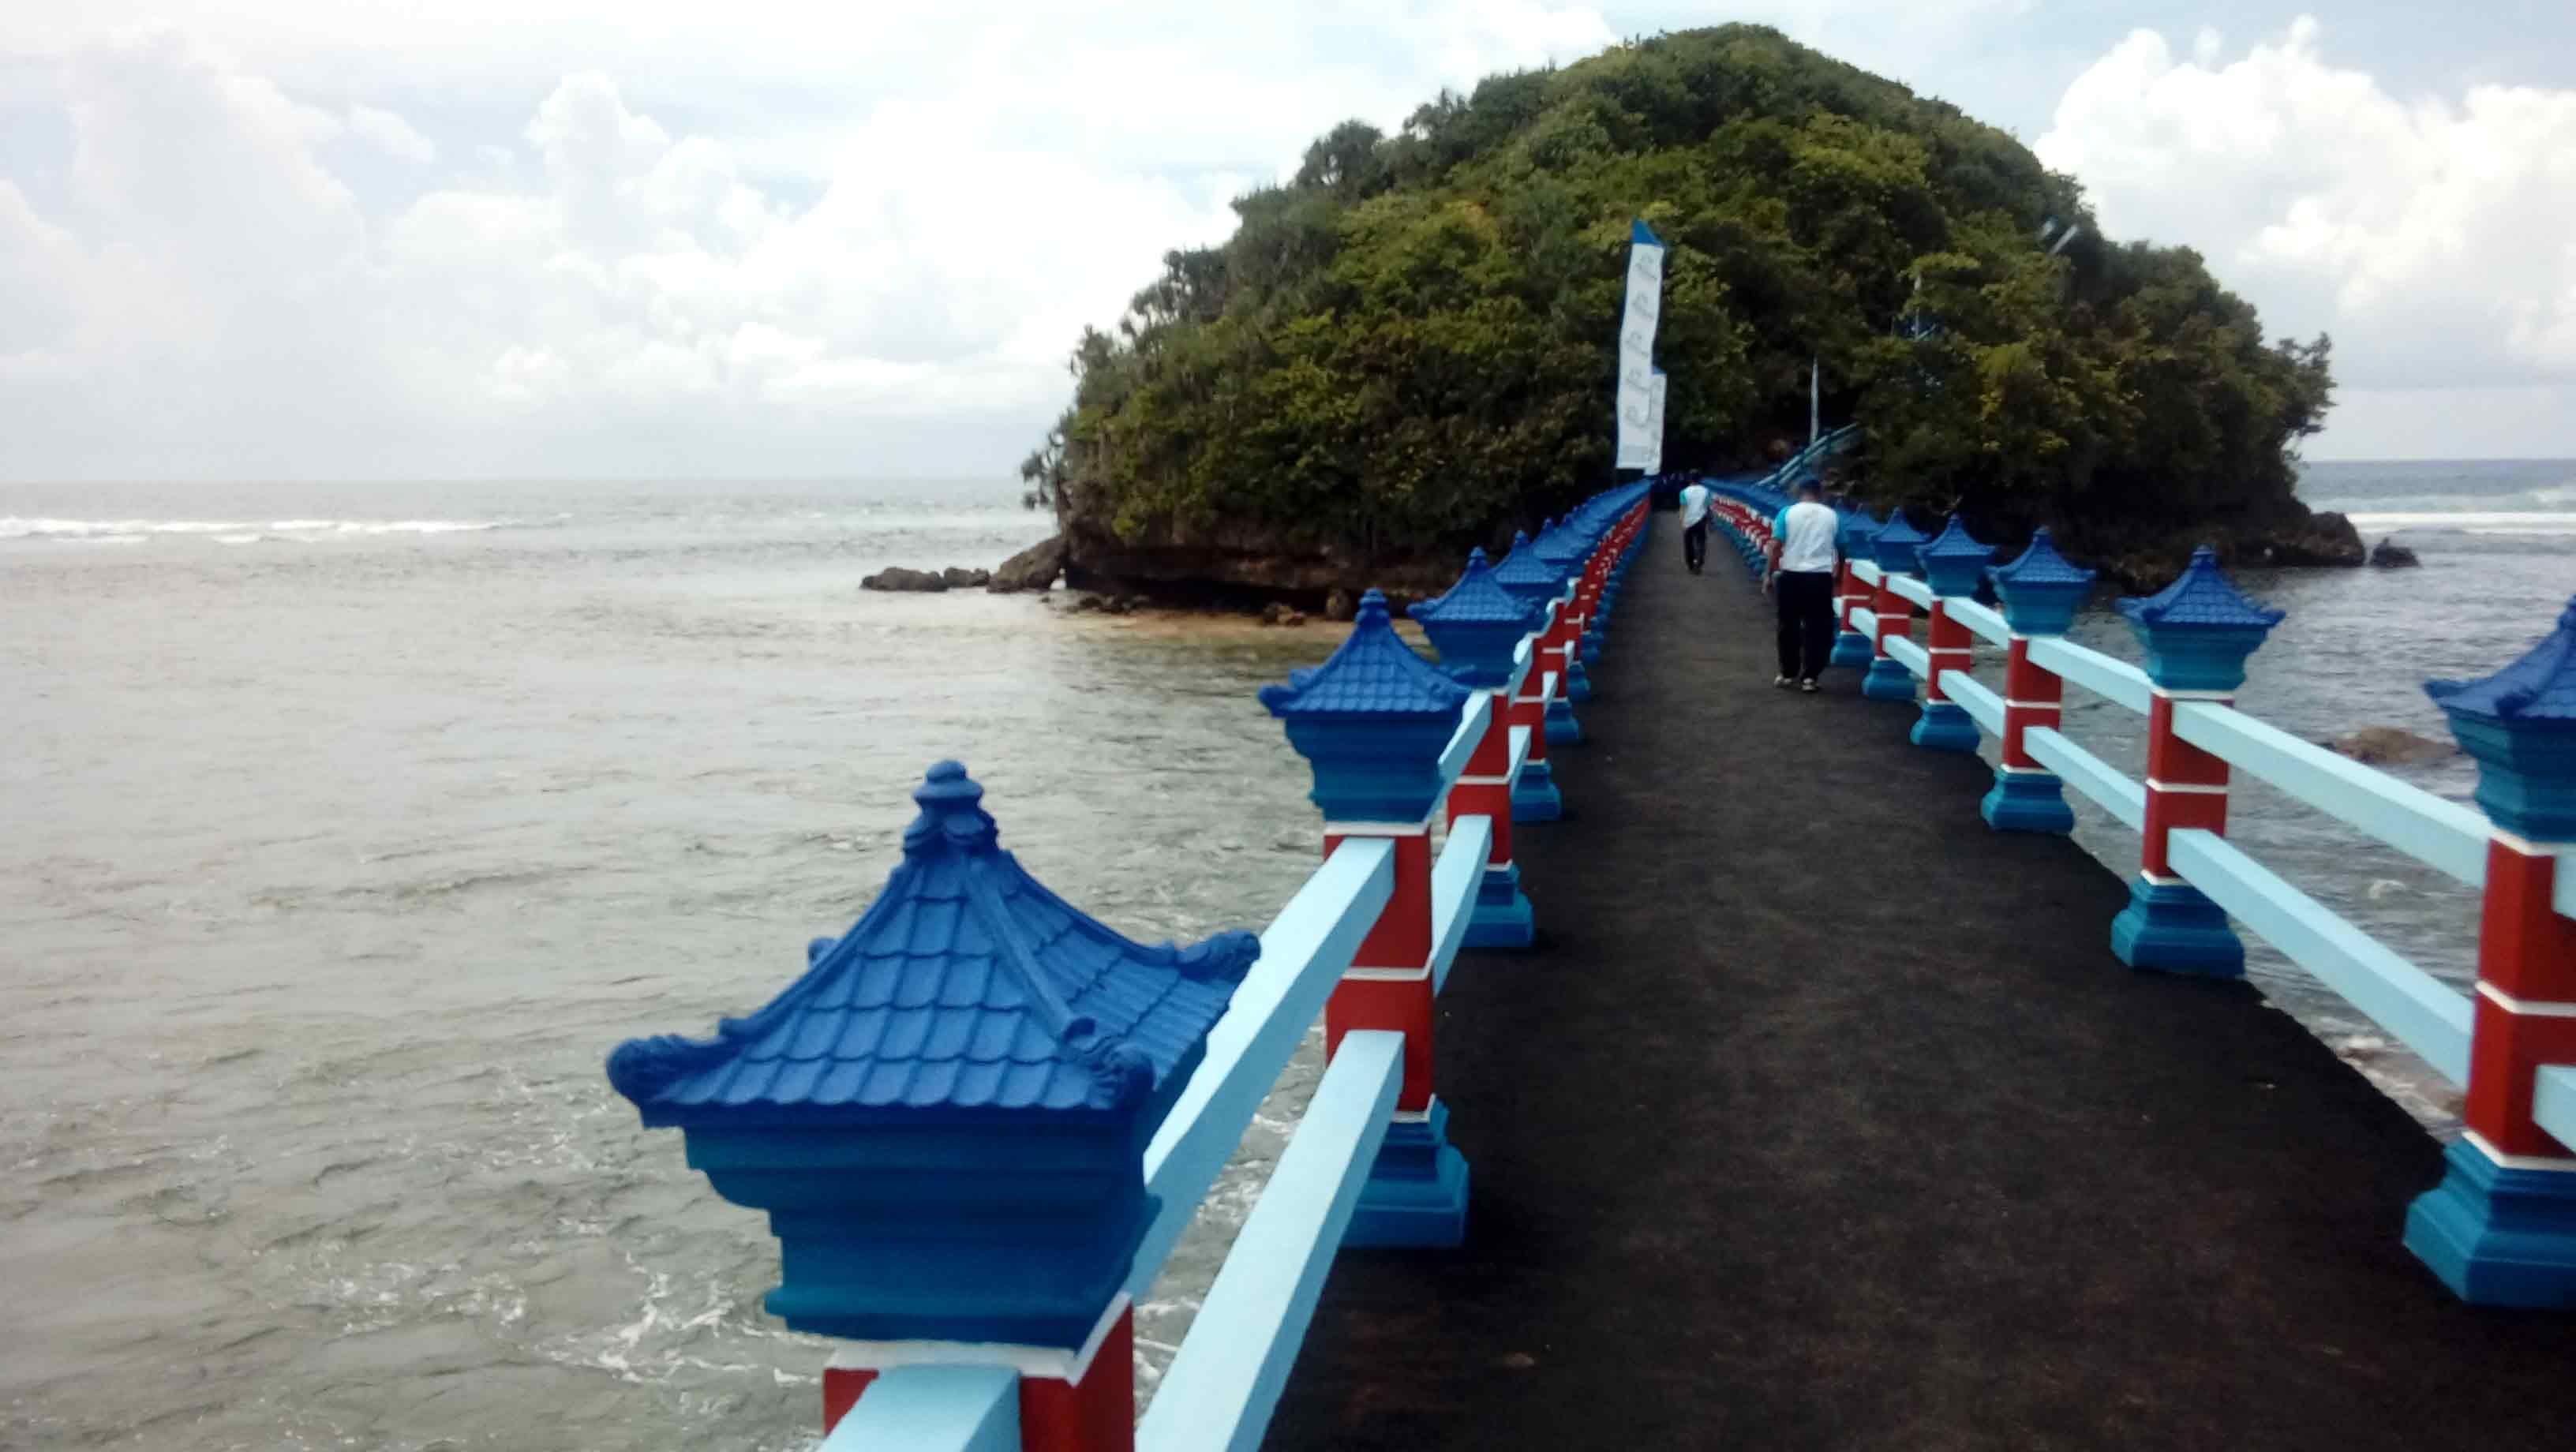 Jembatan Hanoman Ikon Baru Wisata Pantai Balekambang Malang Park Slide Park Hanoman